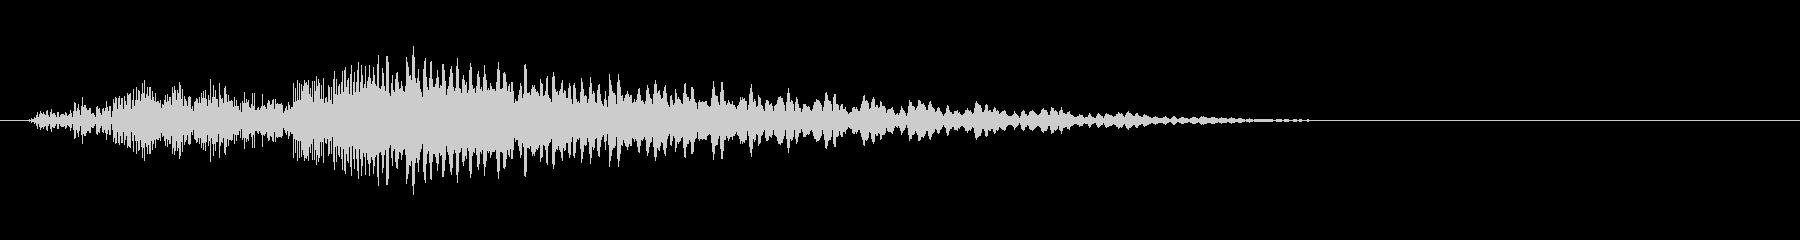 SF 移動音 14の未再生の波形